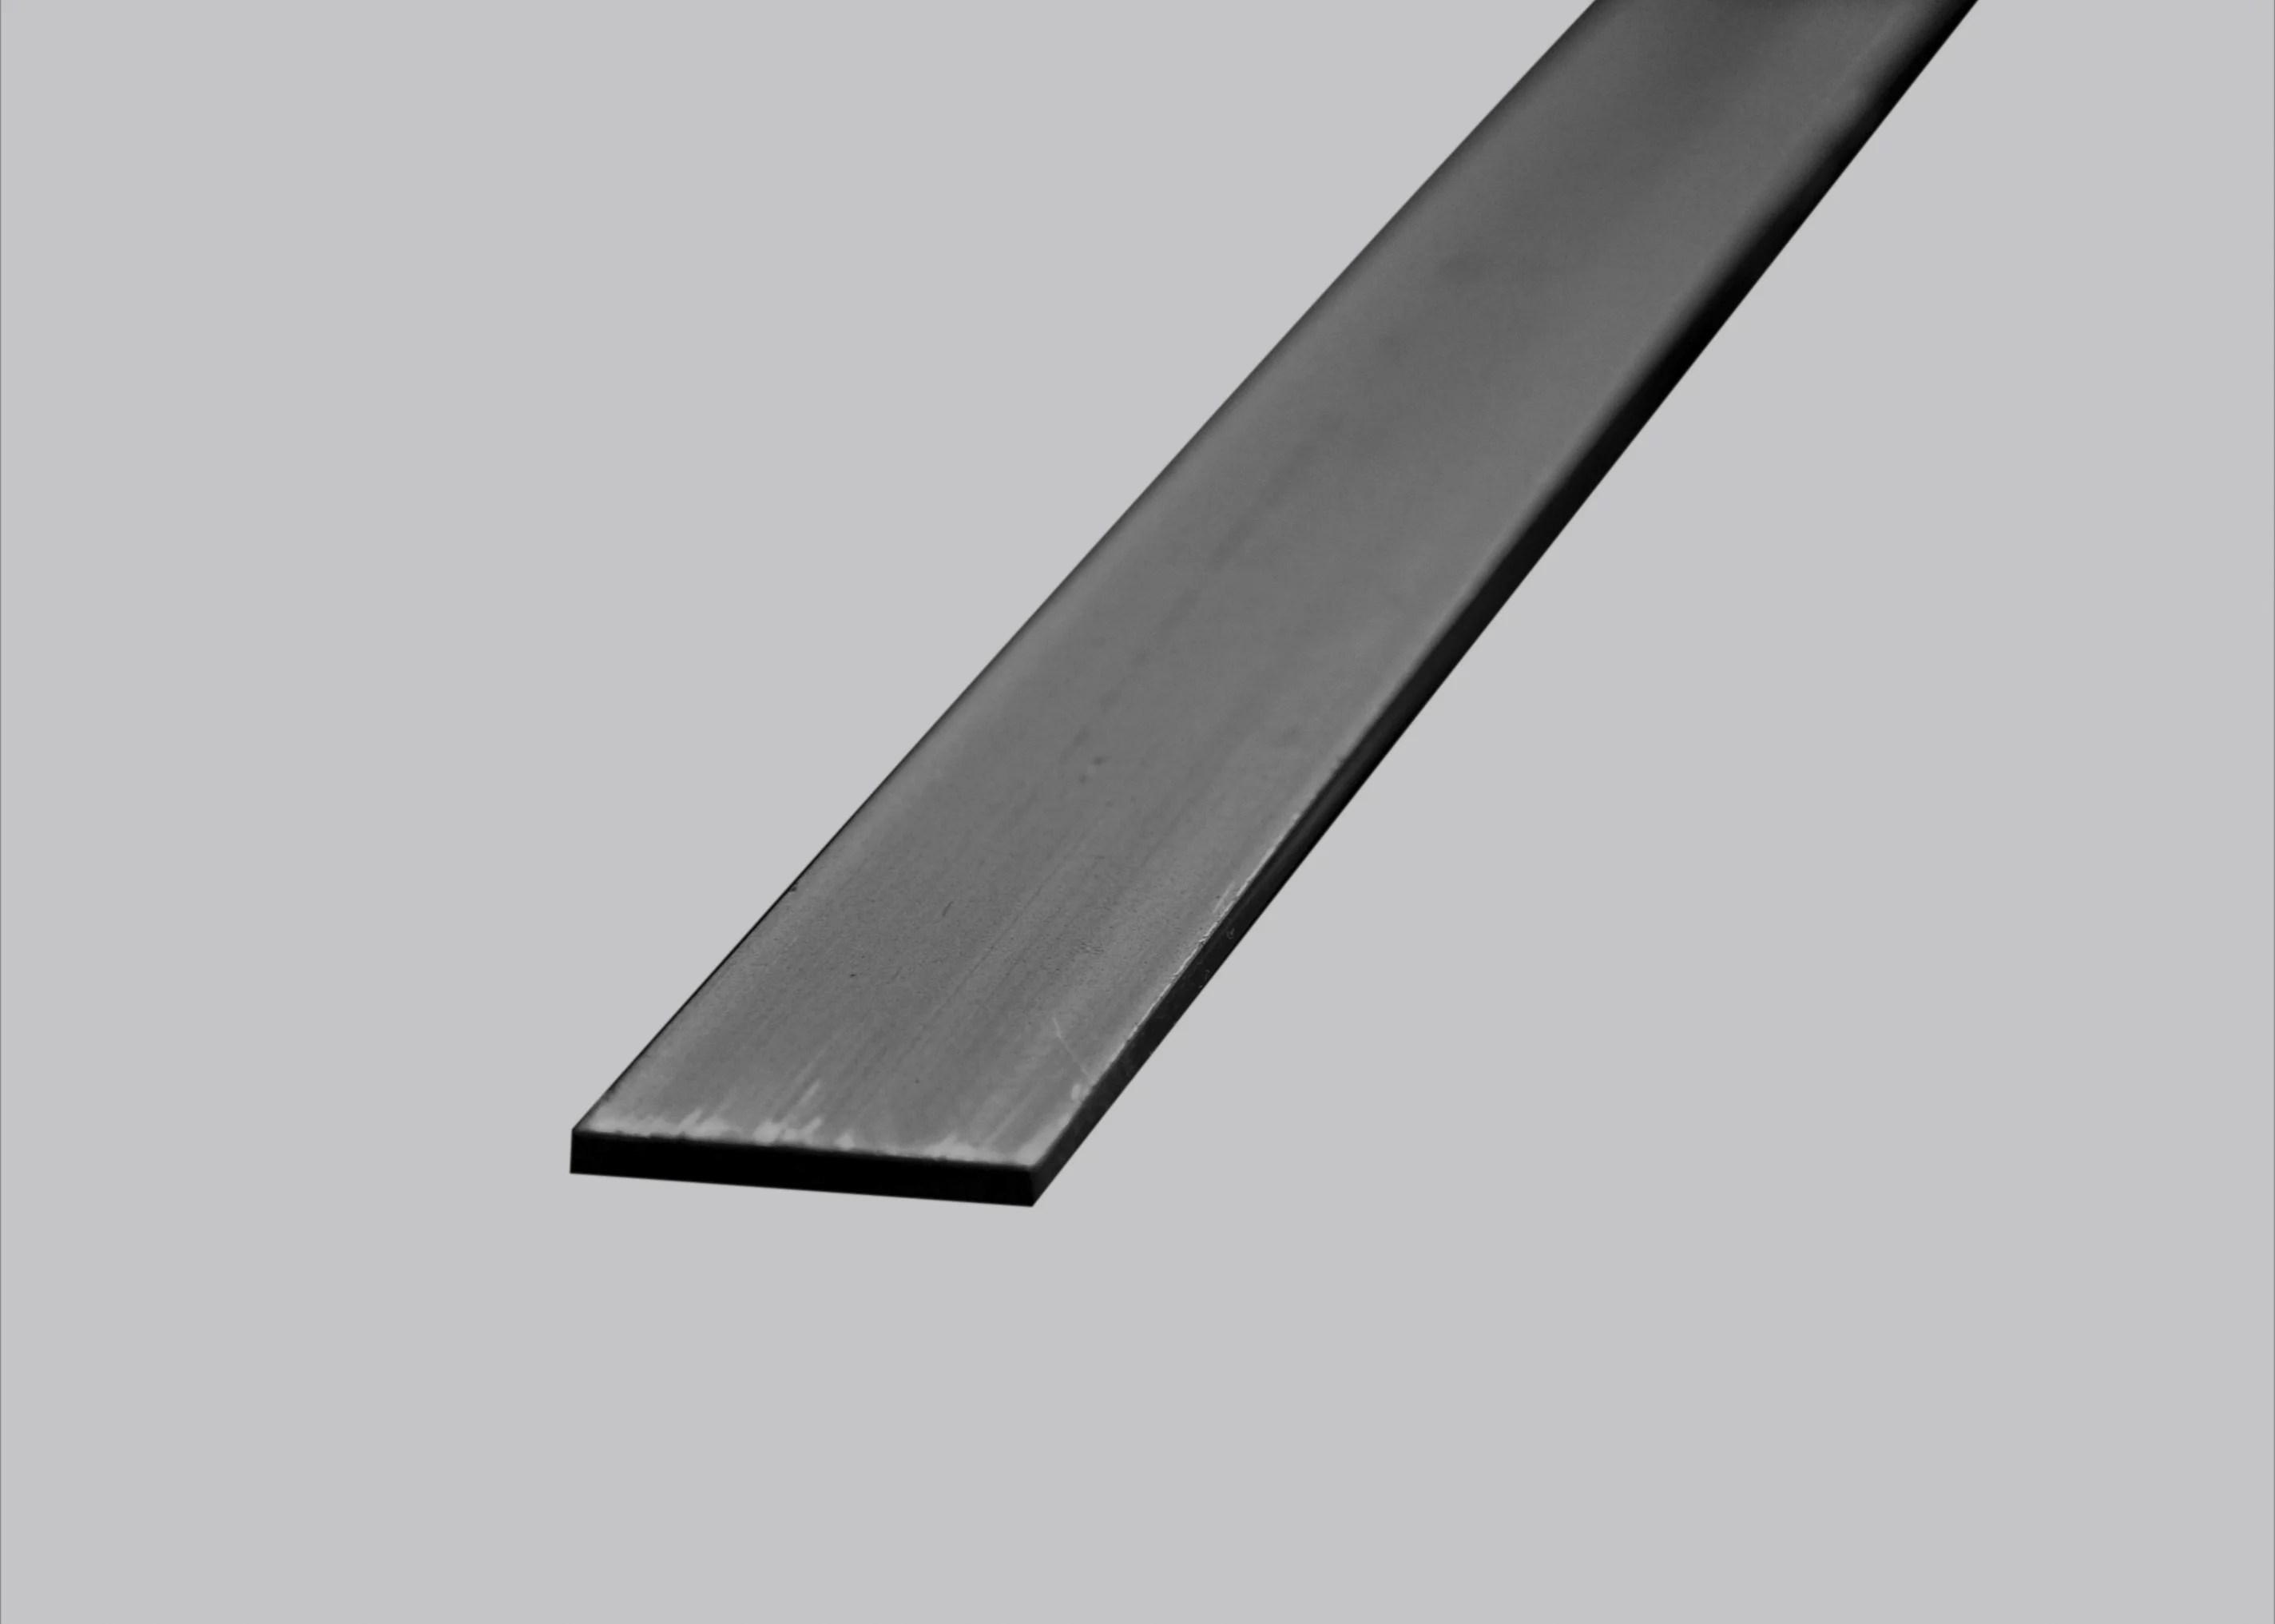 Plat Pvc Noir 2 X 30 Mm L 2 6 M Leroy Merlin